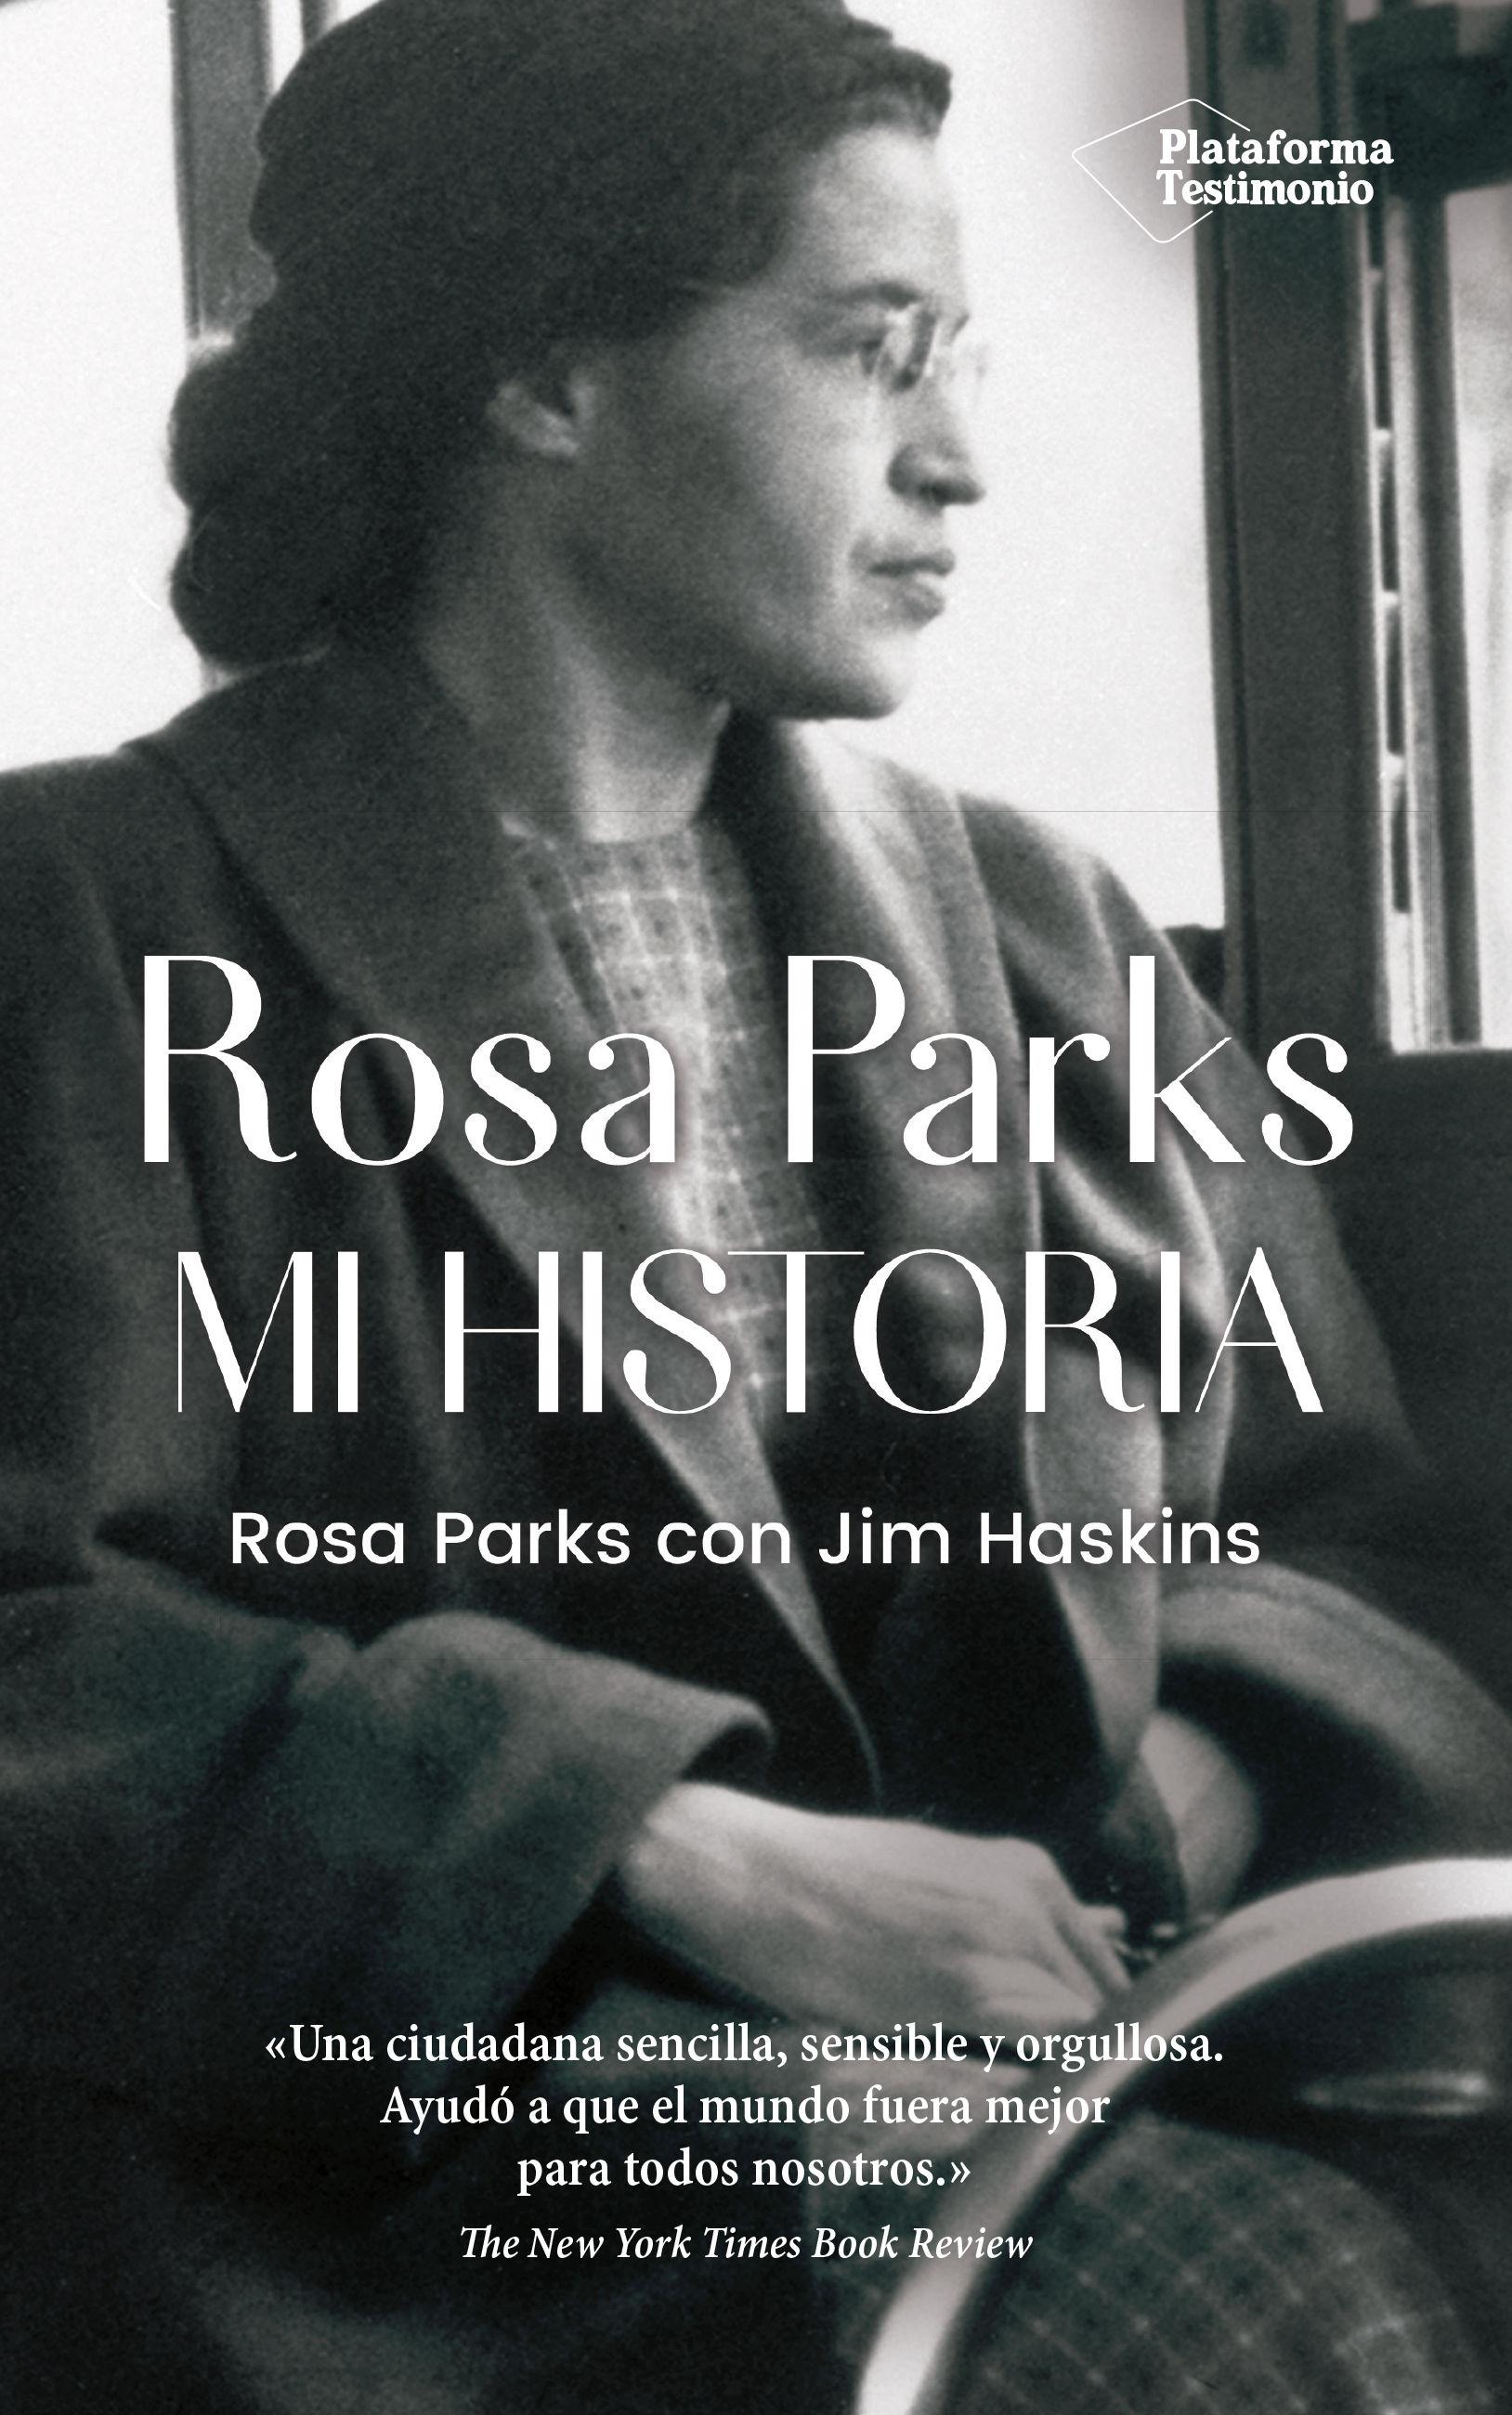 ROSA PARKS MI HISTORIA